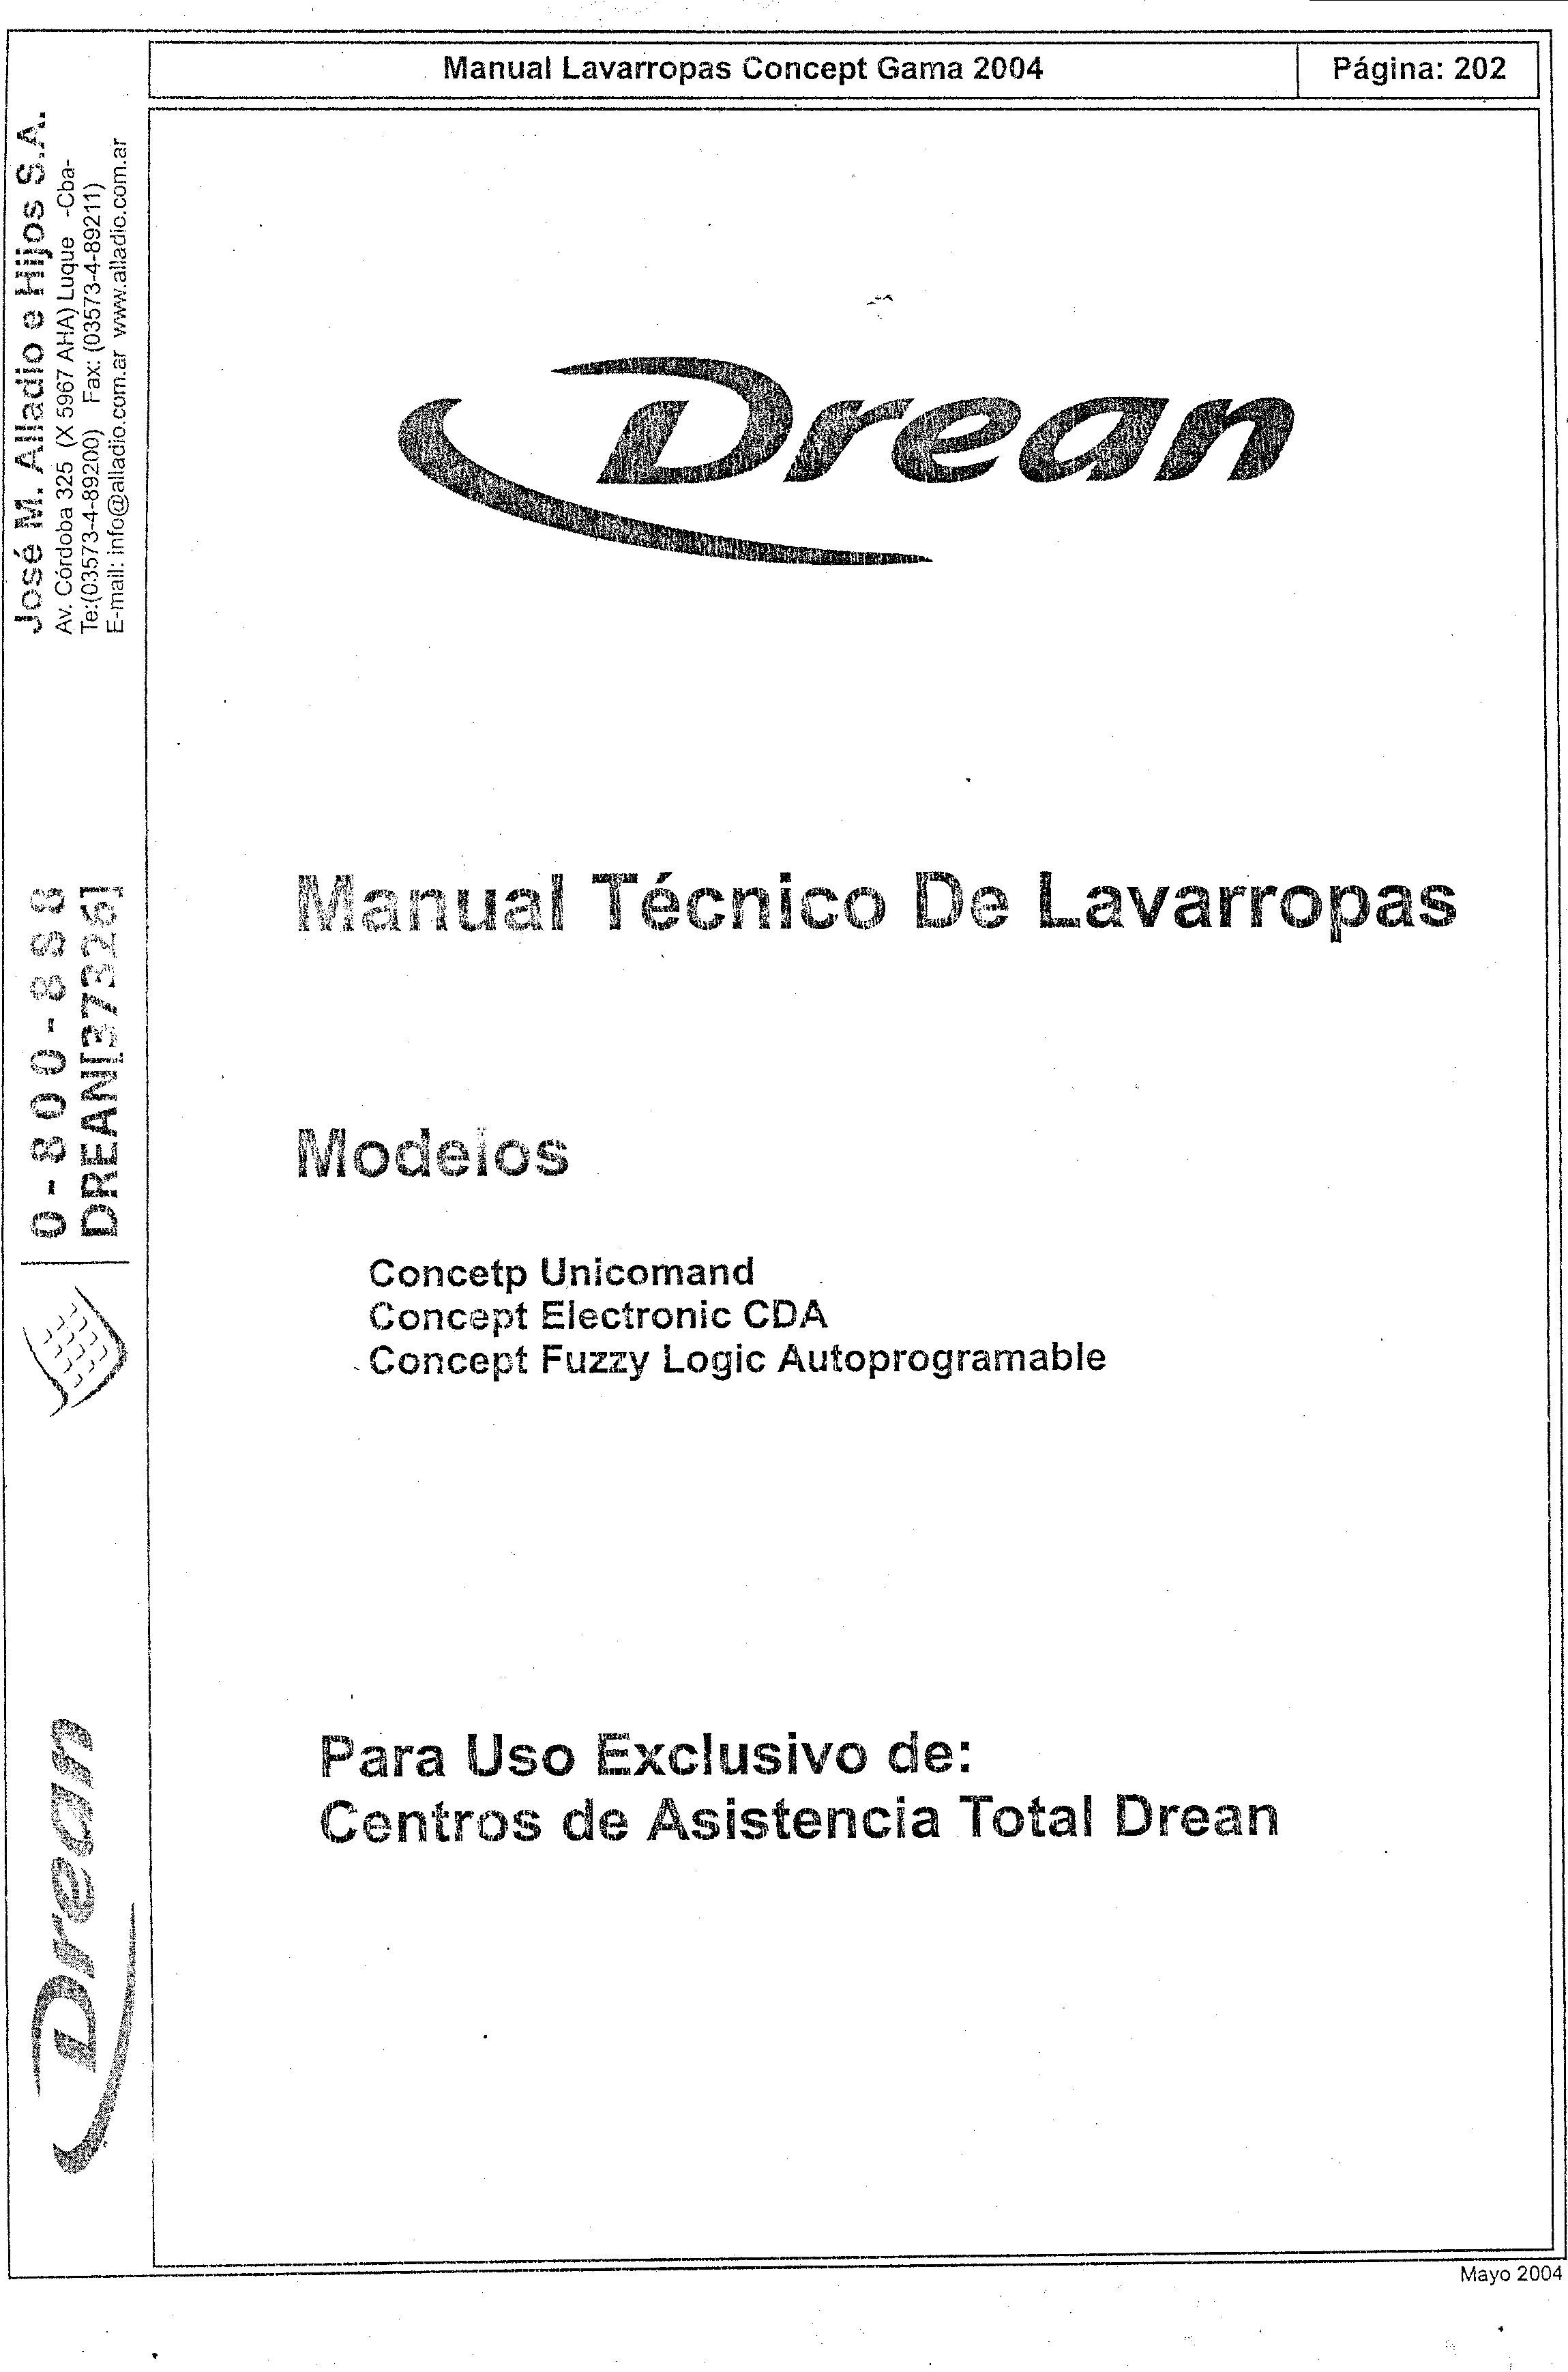 Drean Drean Unicommand 202 Jpg Diagramas De Lavarropas